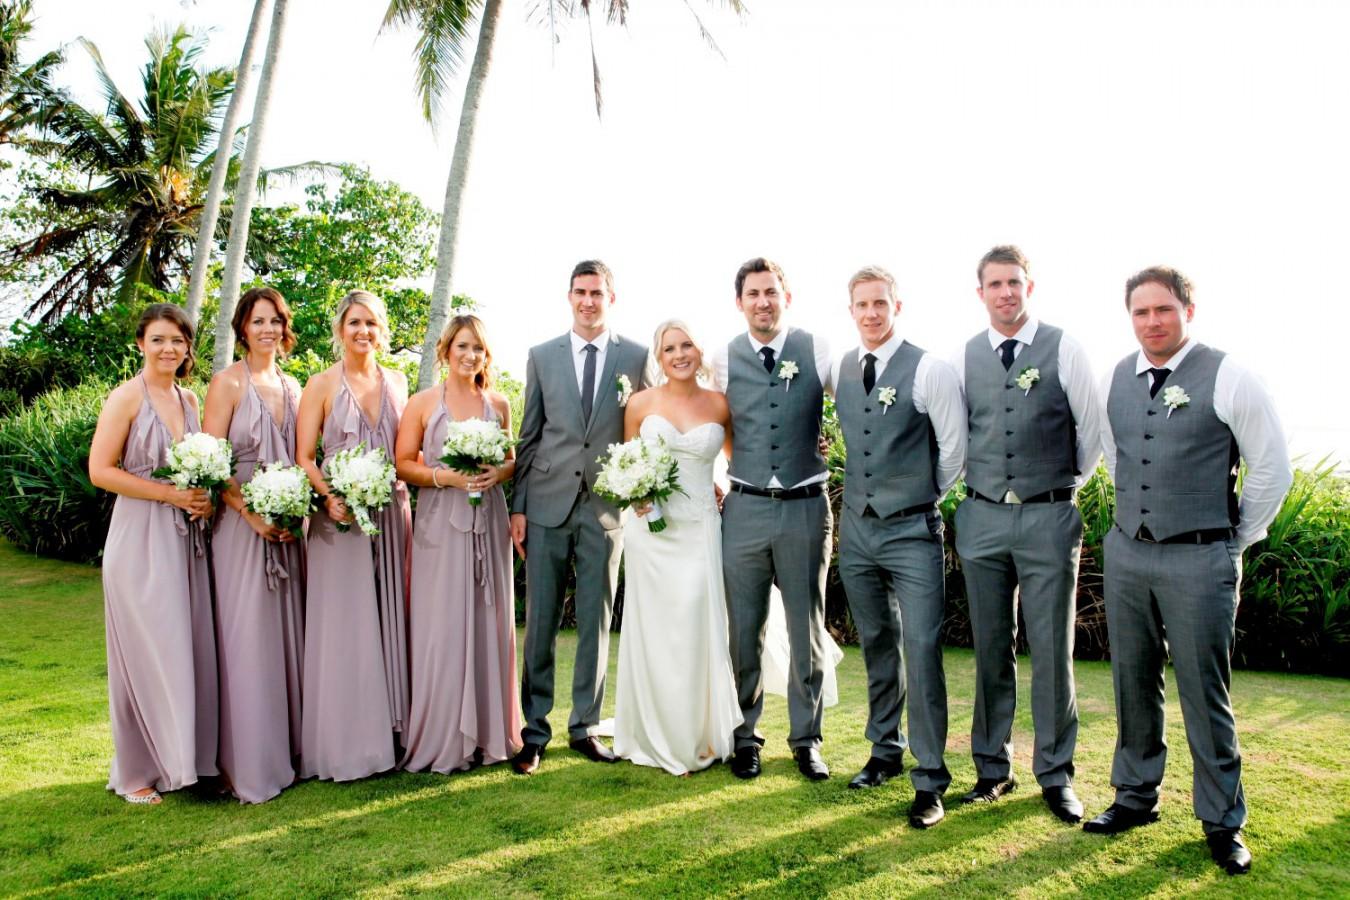 2011.10.16, Megann and Daniel, Ombak Luwung, MJY - Bali Wedding Paradise (22)